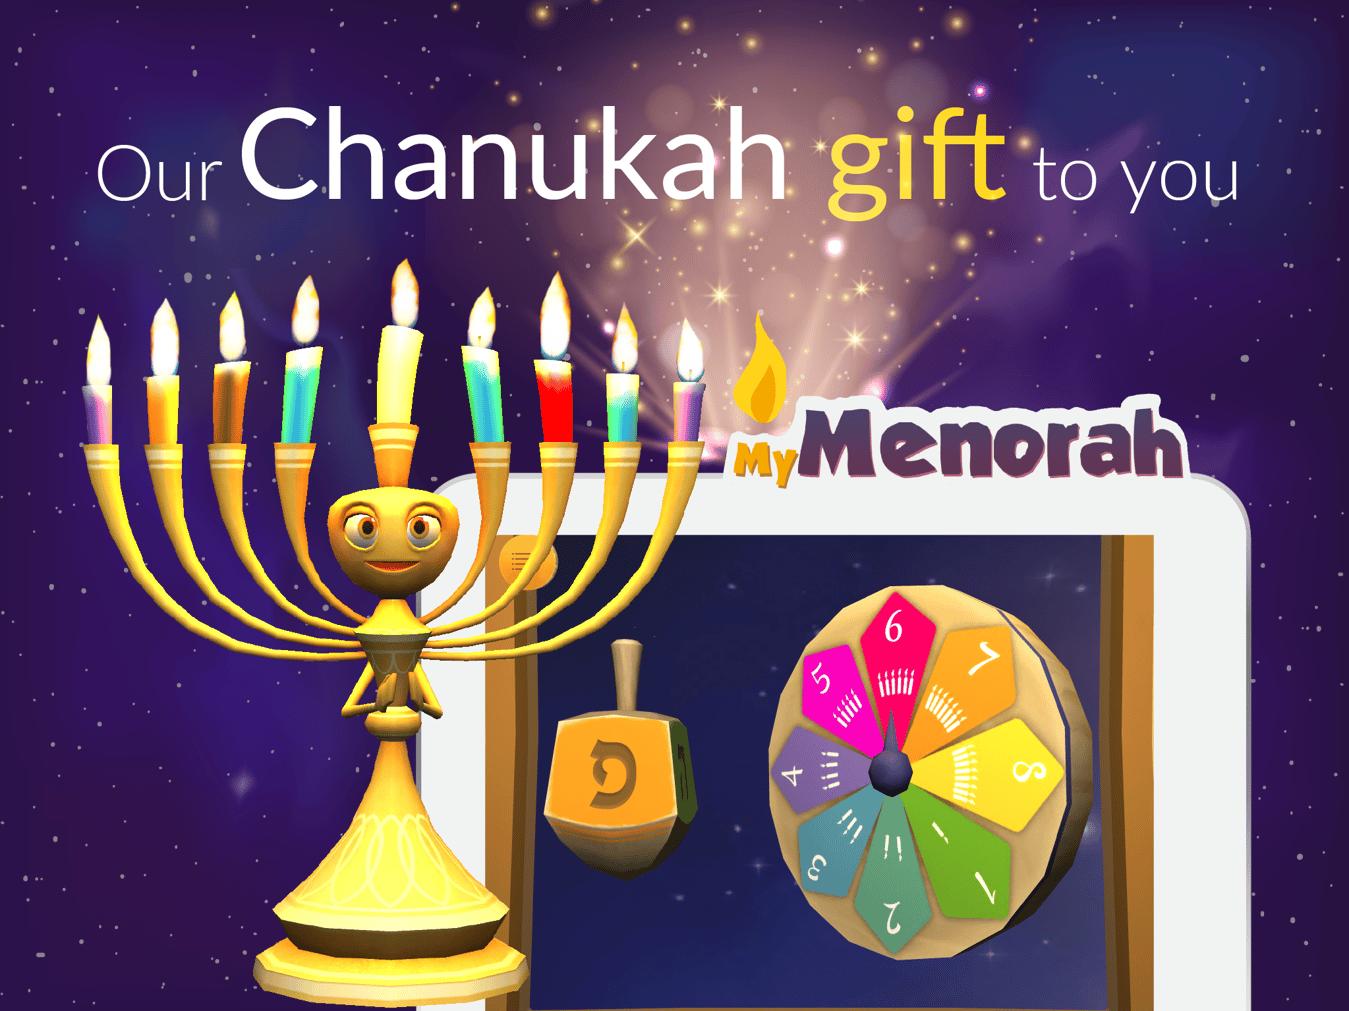 chanukah advert 2017 no icons.png